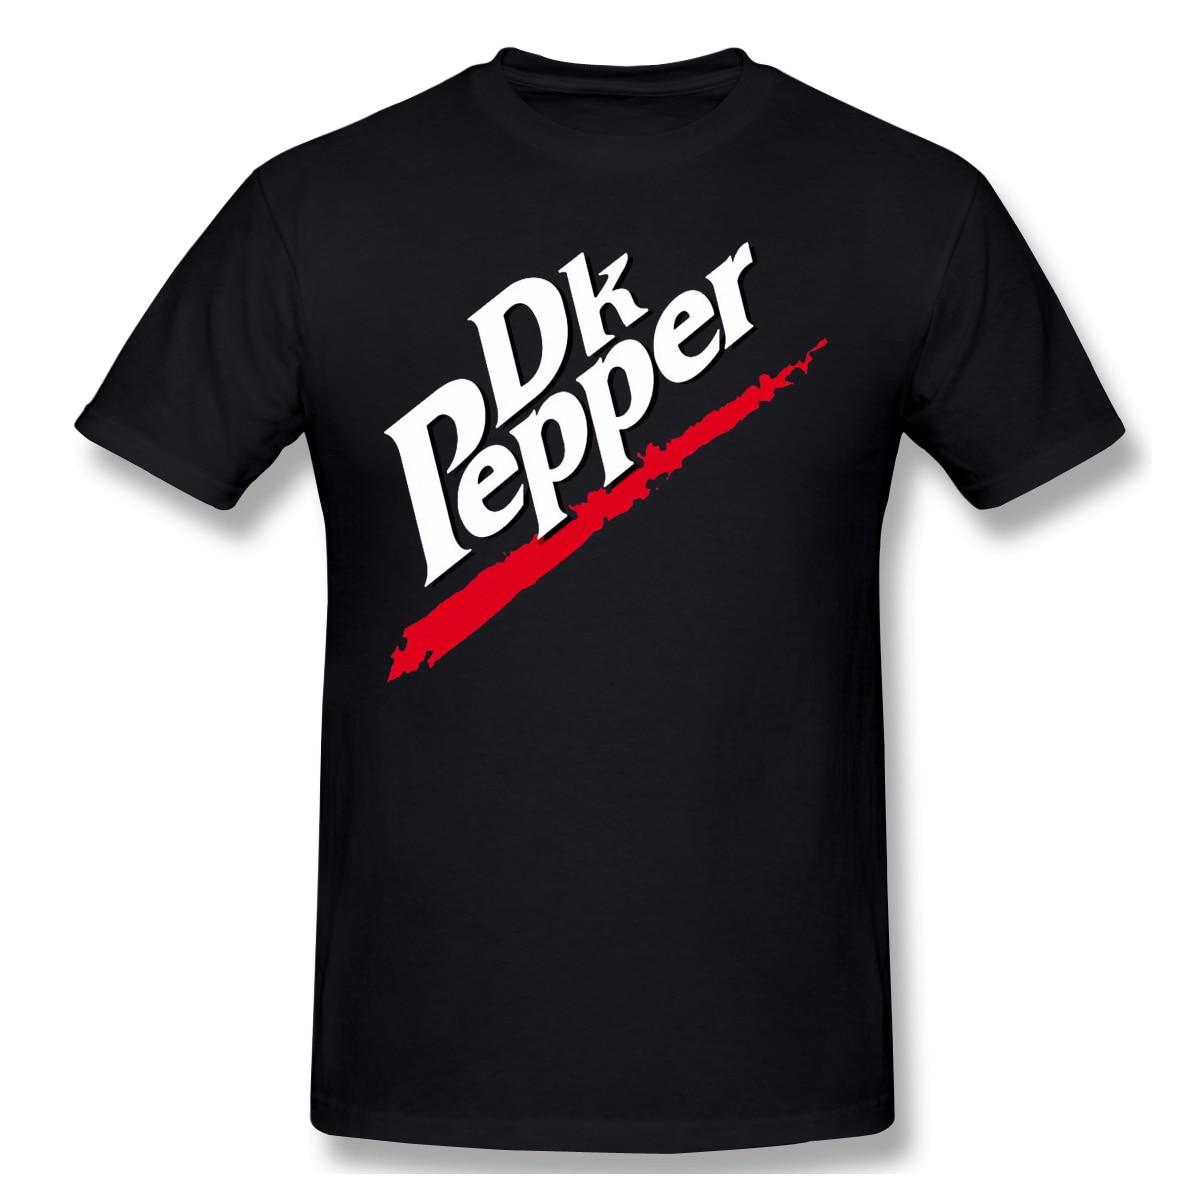 Nueva camiseta de verano Steins Gate - DK pimienta camiseta algodón Steins Gate ofertas camiseta